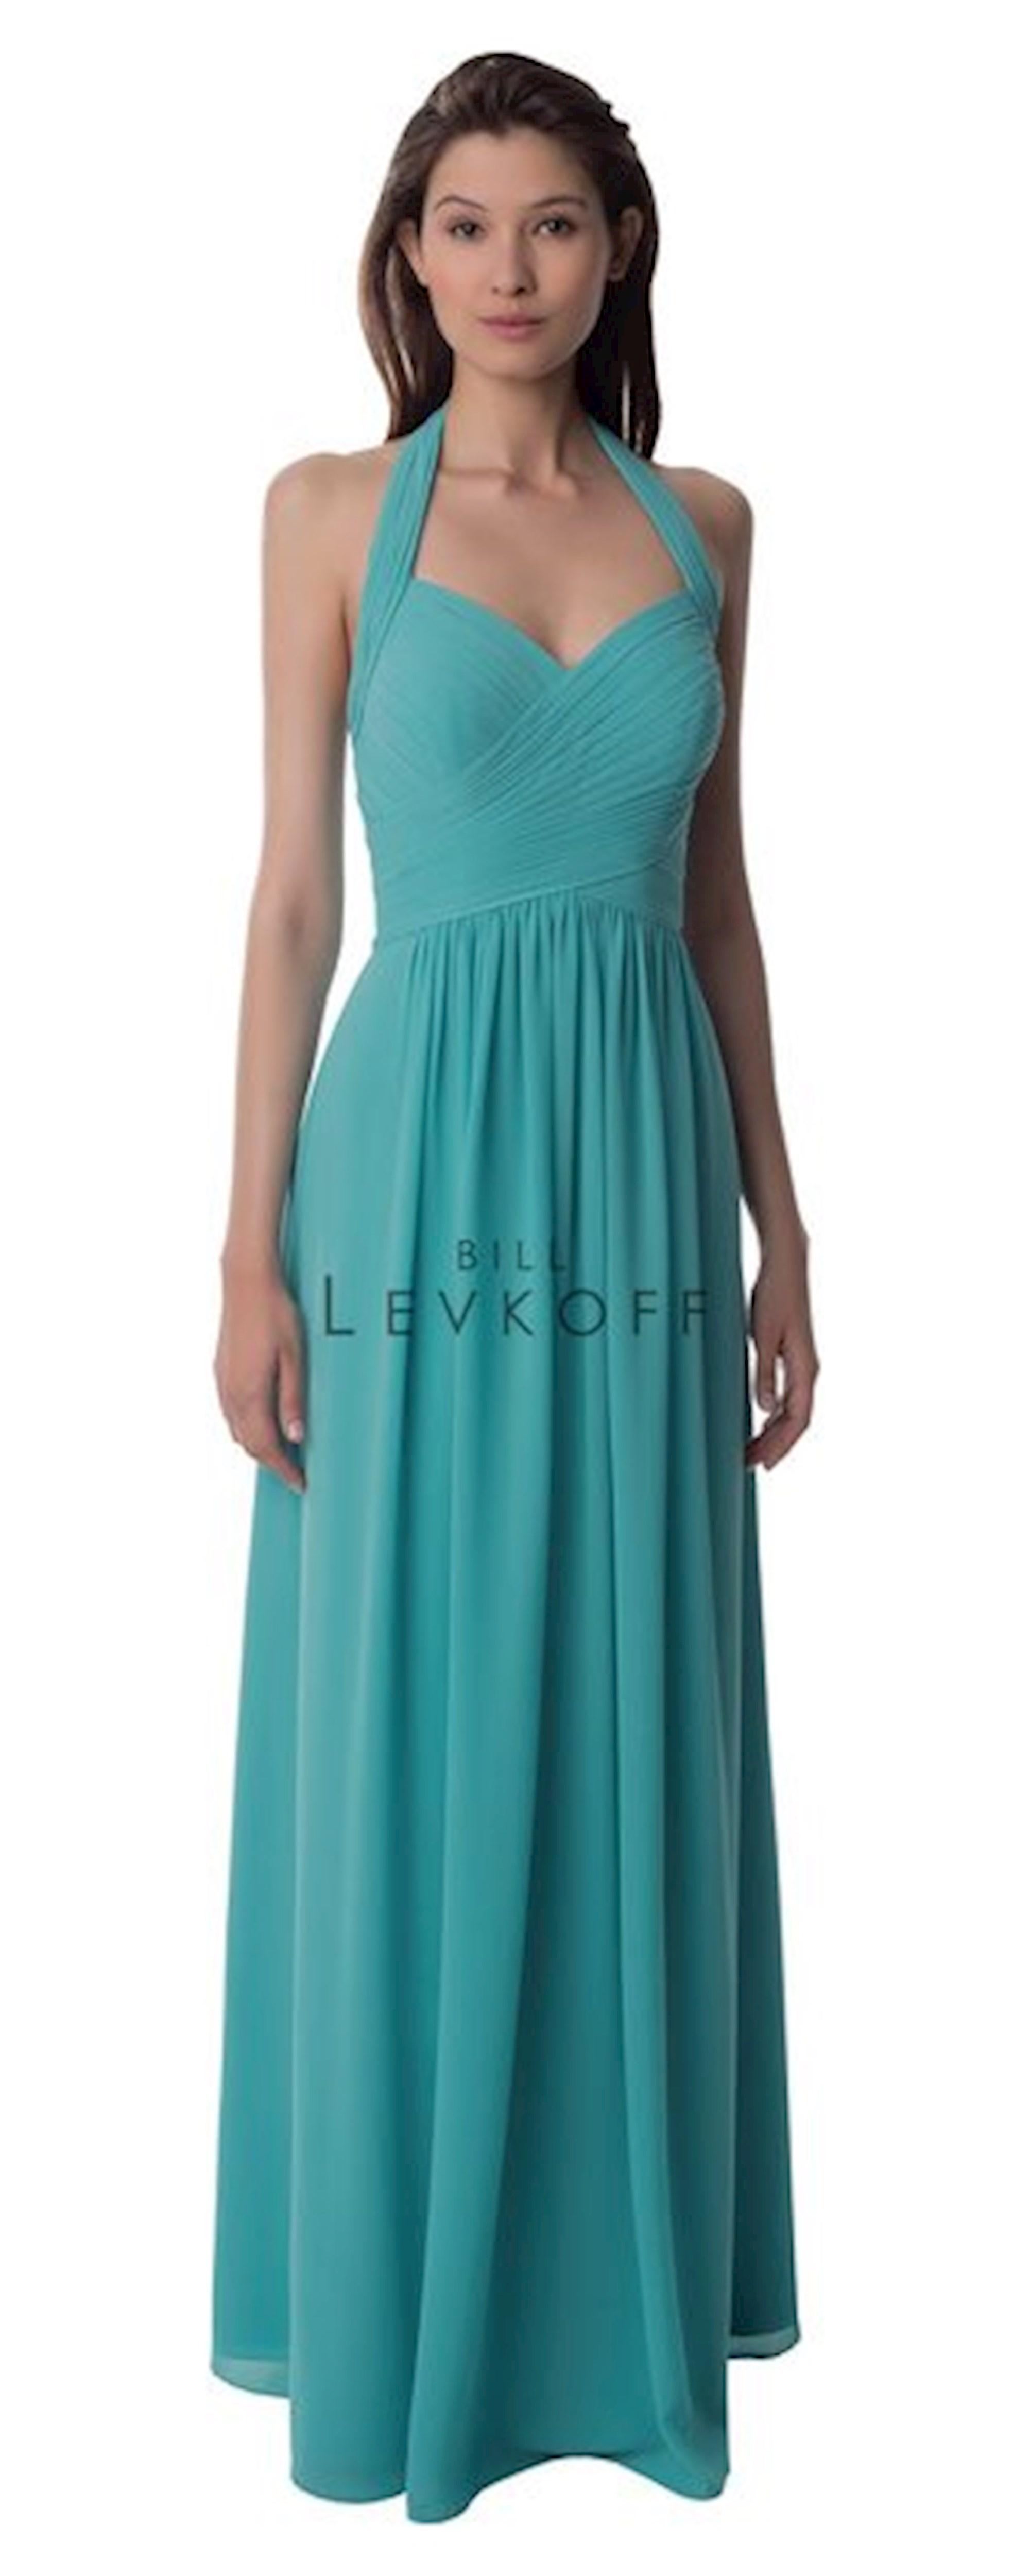 b4d495afa3c7 Bill Levkoff Bridesmaids Dresses   Regiss in Kentucky - 990